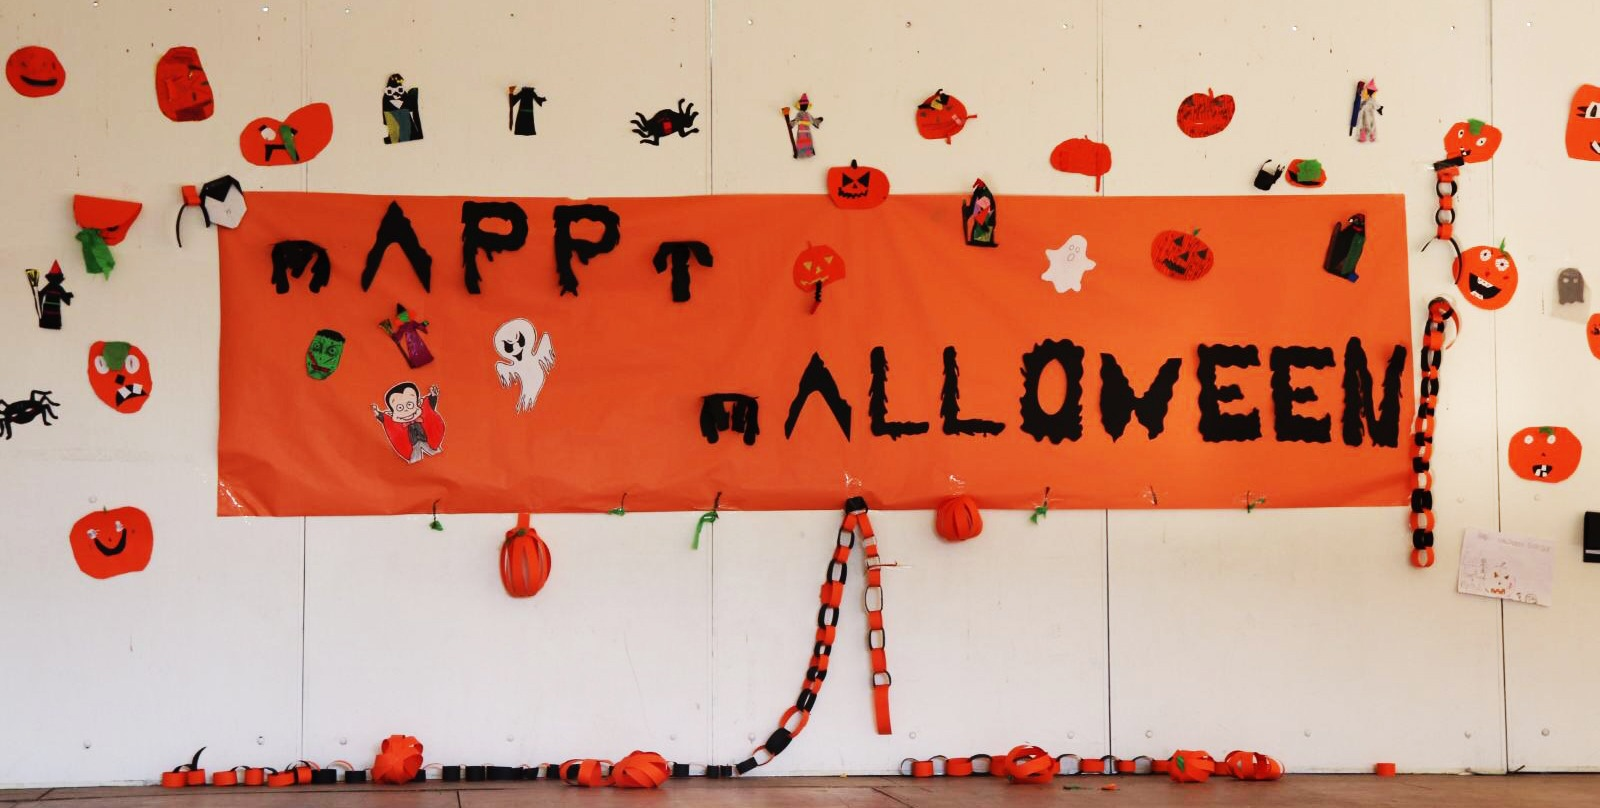 Hoy celebramos Halloween 2017 en CBS